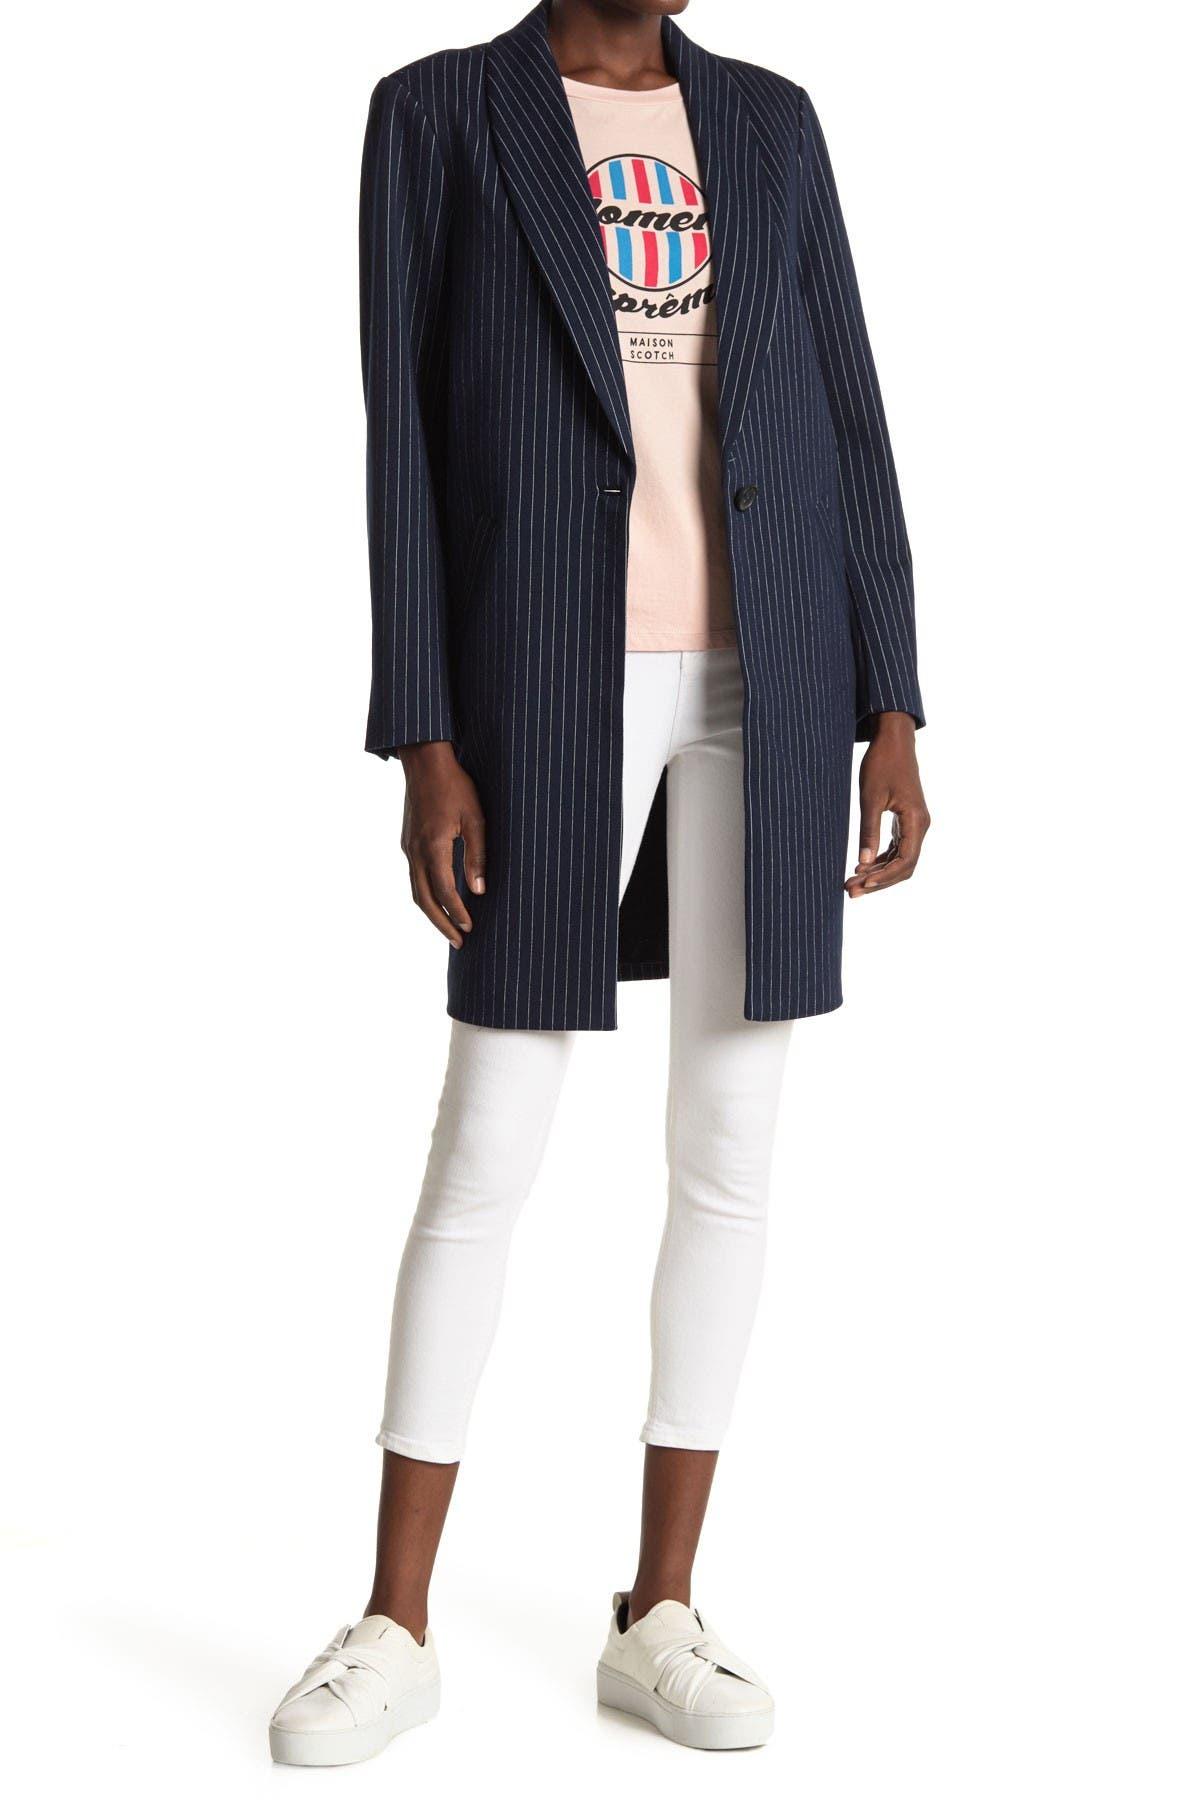 Image of Scotch & Soda Tailored Stripe Jersey Coat